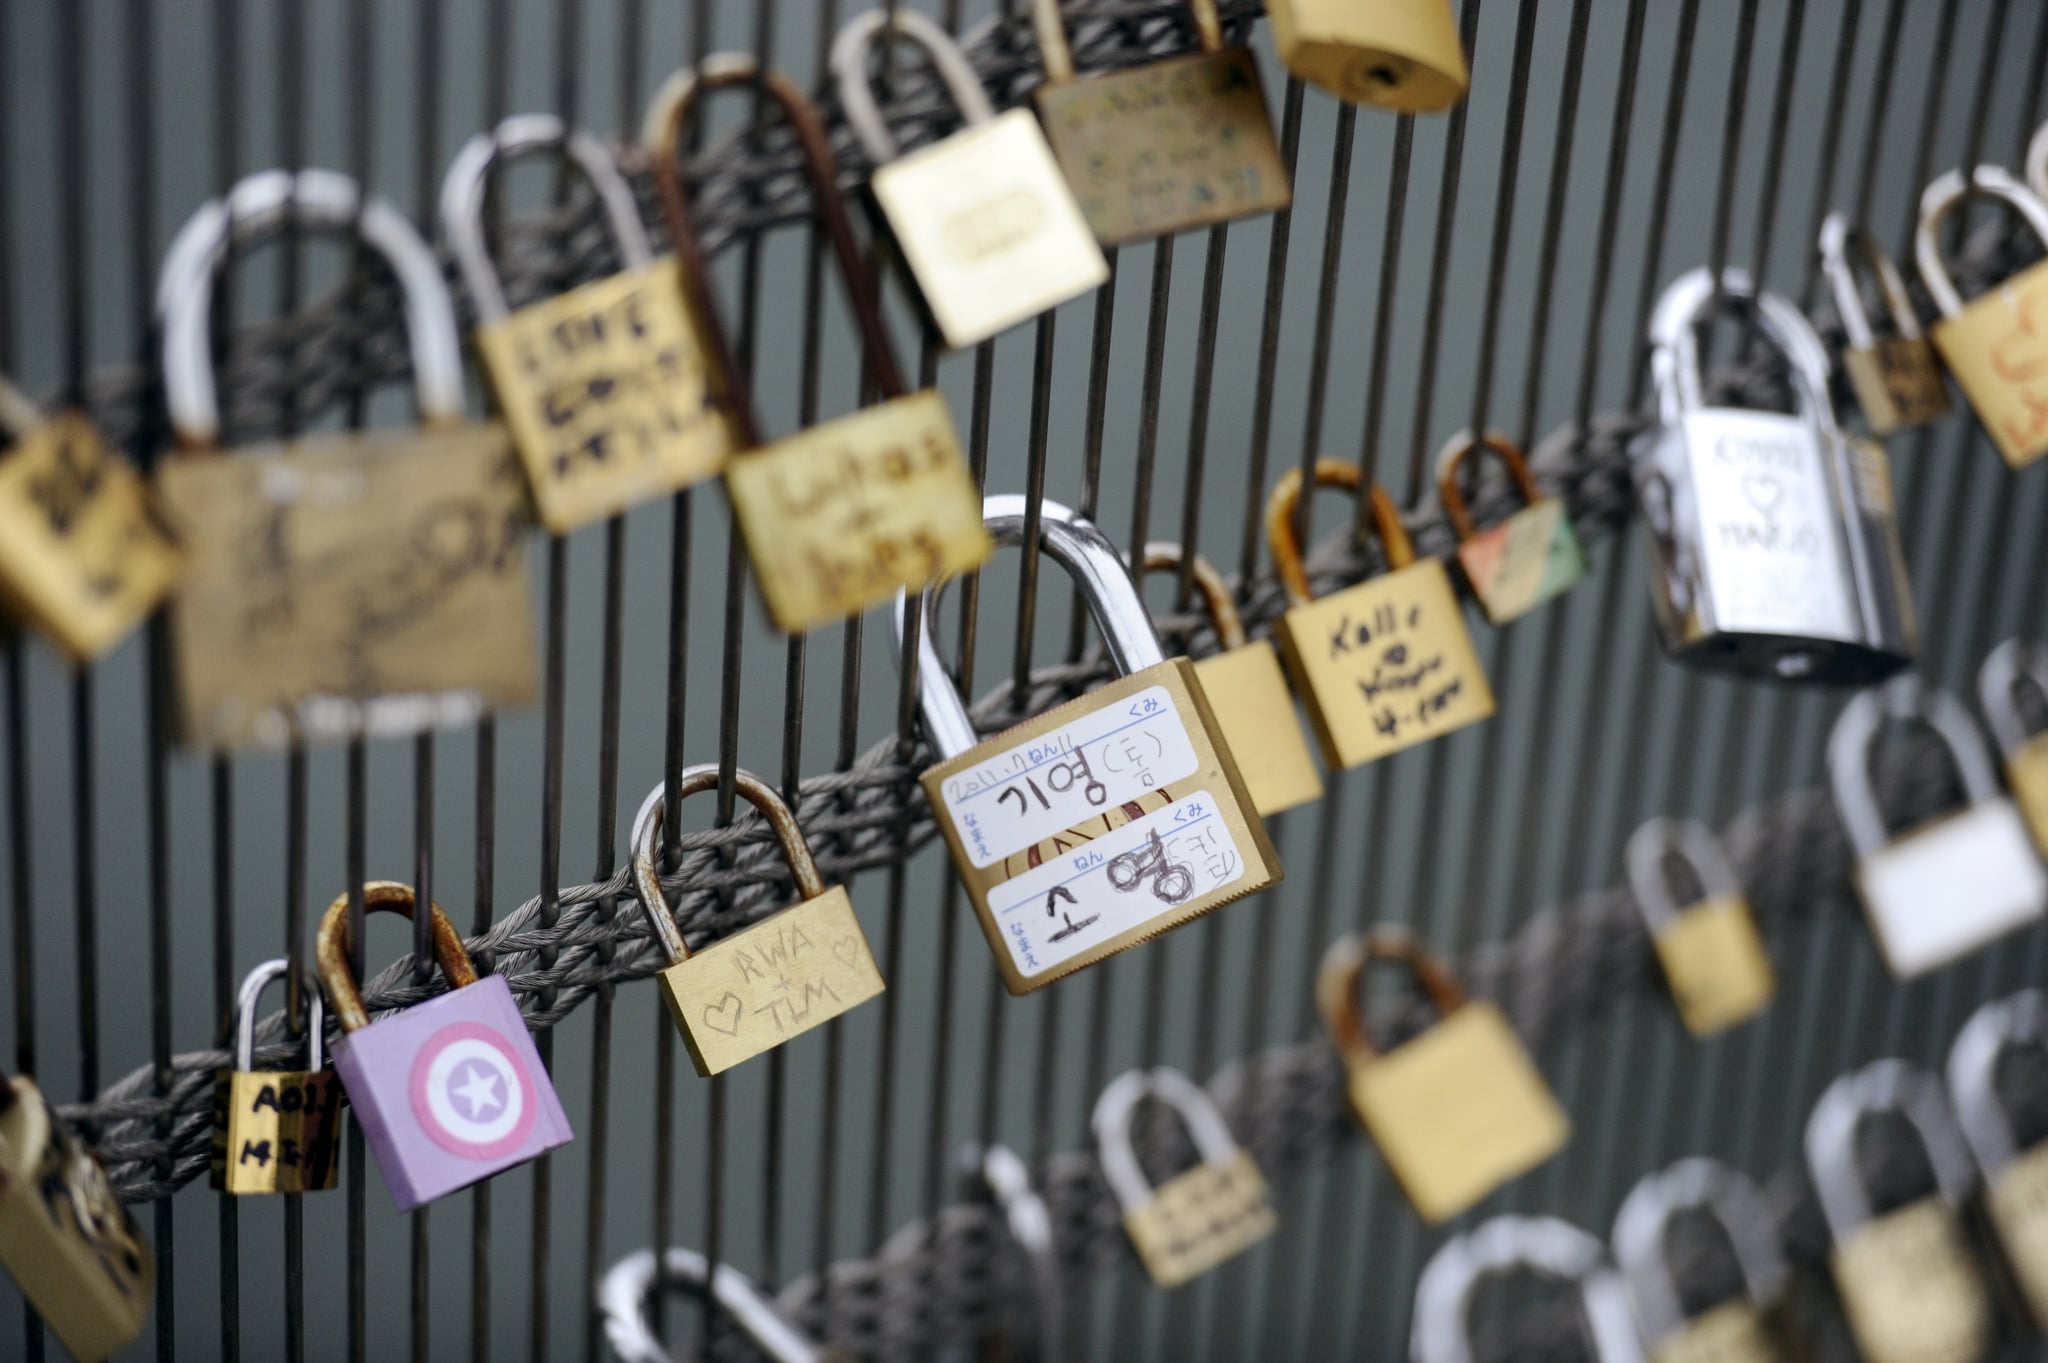 Locks were lined up on the Leopold Senghor bridge in Paris.